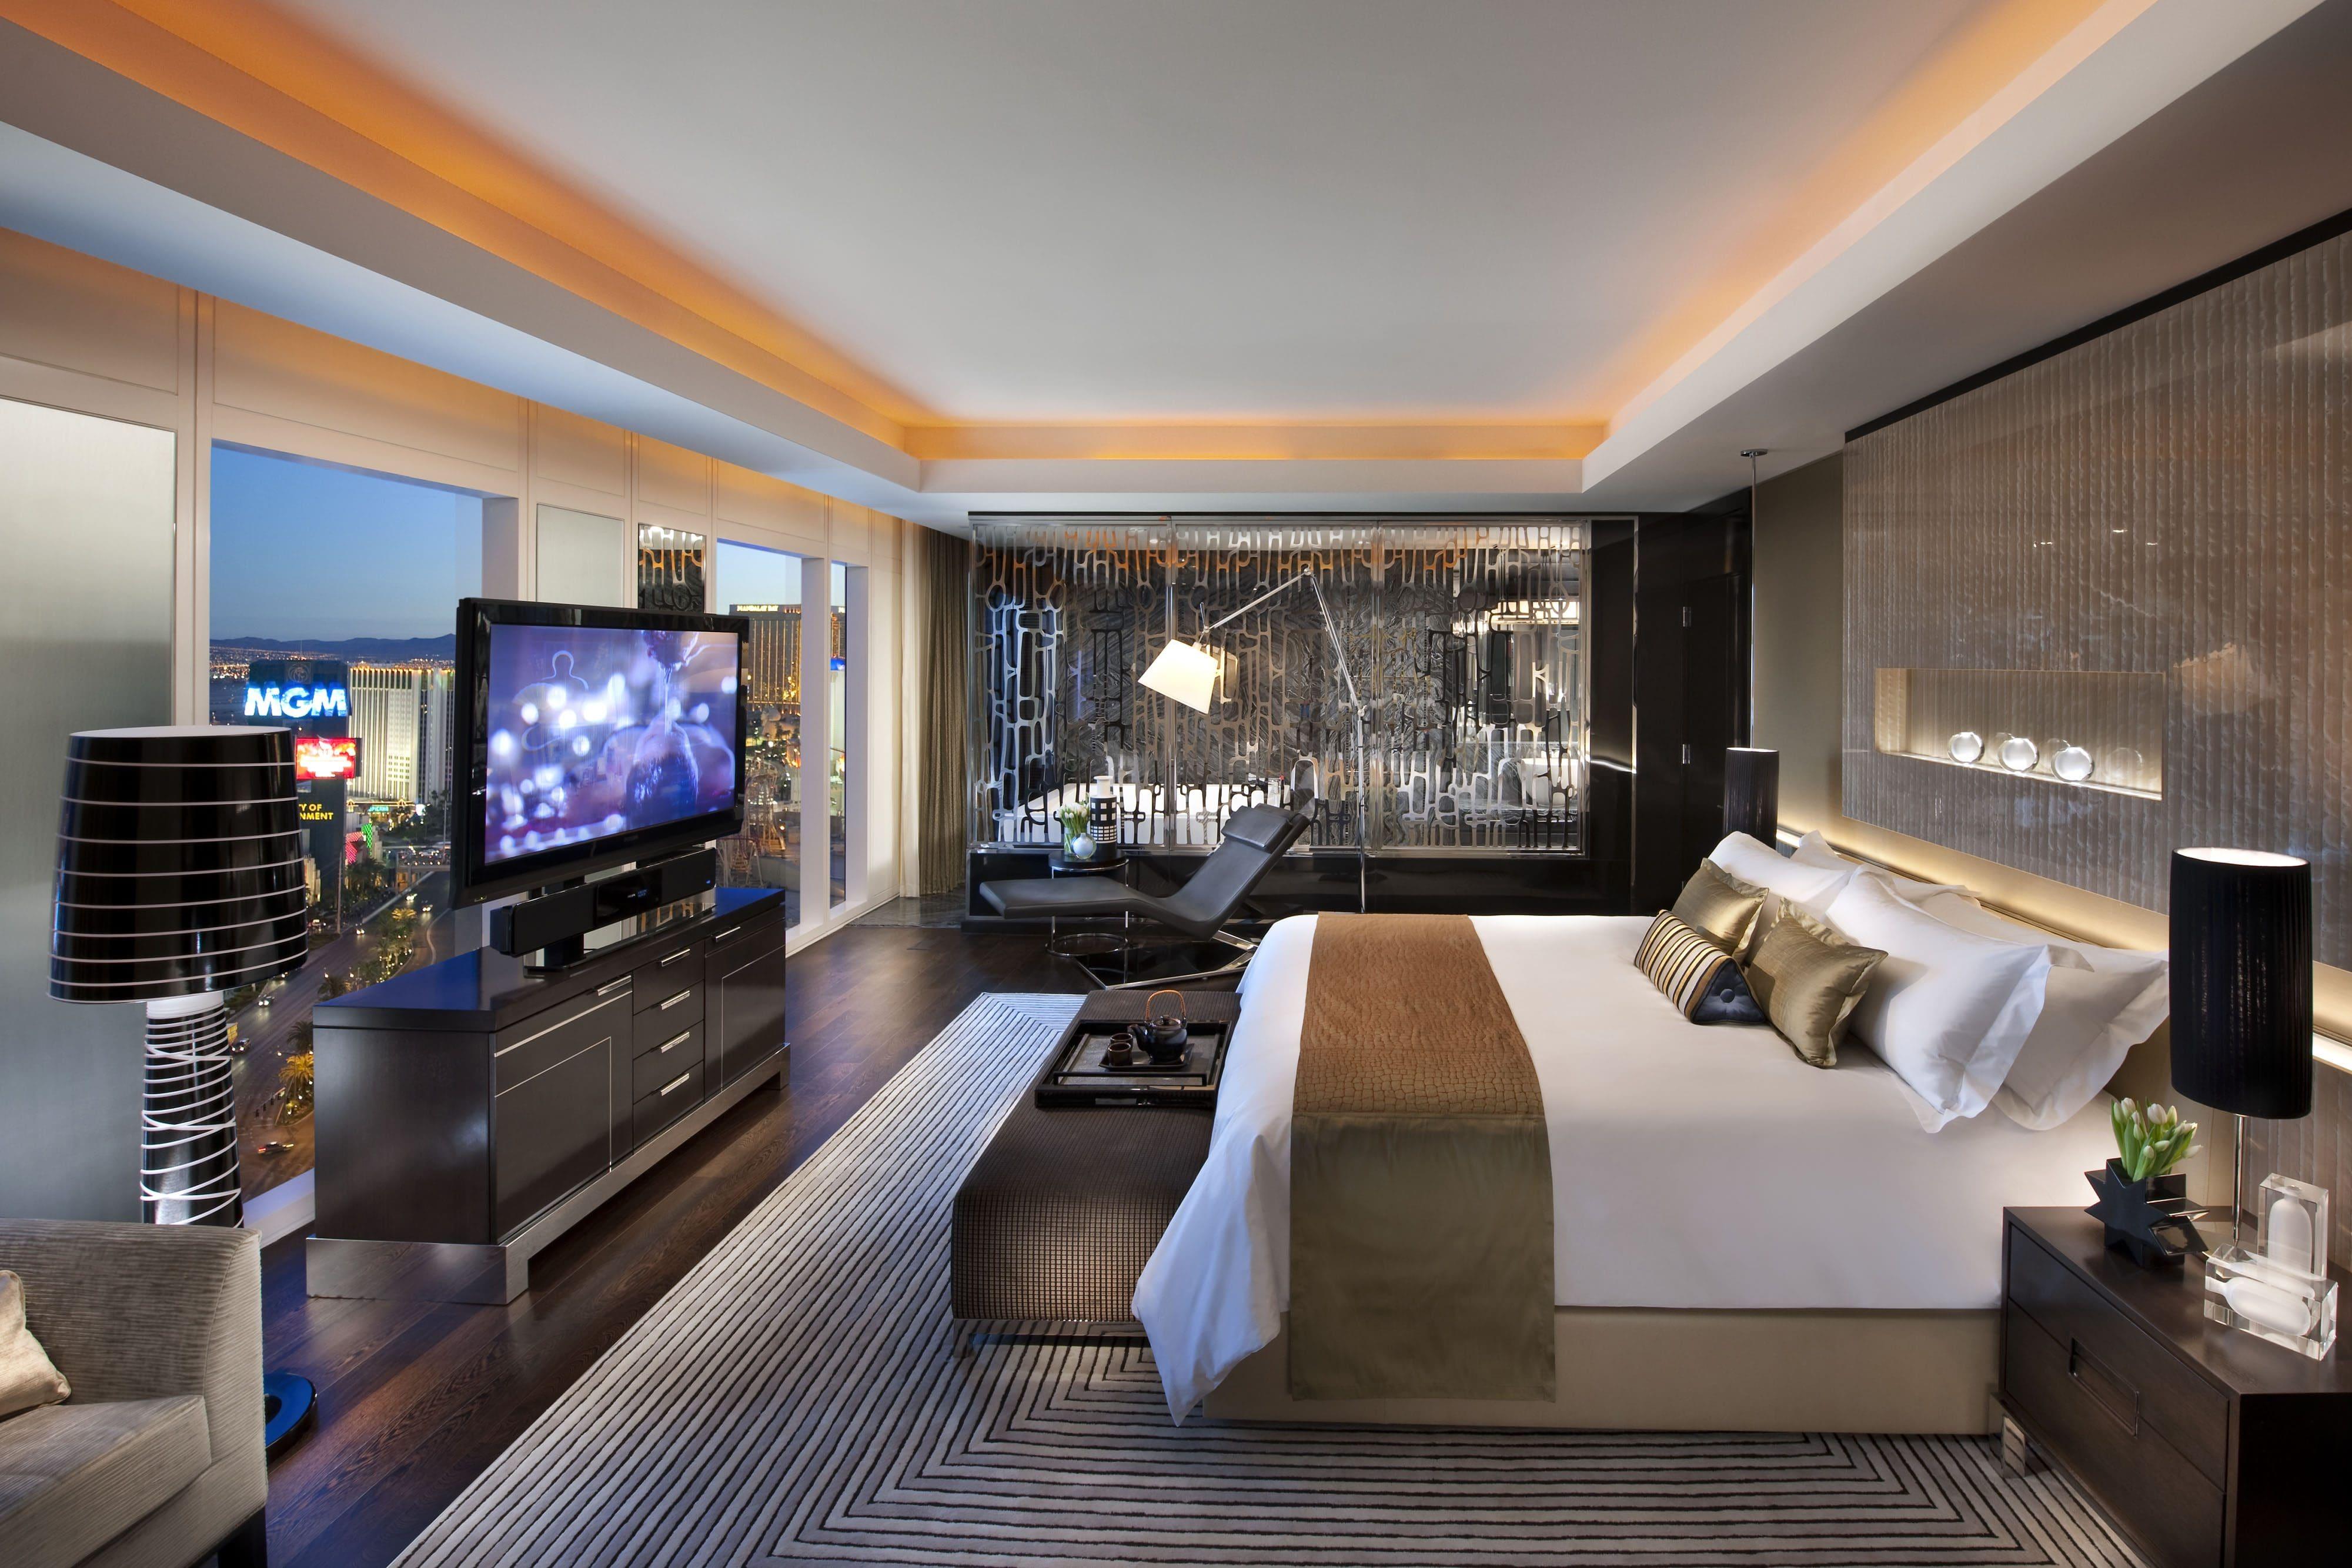 Http://photos.mandarinoriental.com/is/image/MandarinOriental/las Vegas Suite Emperor Suite Bedroom 2?